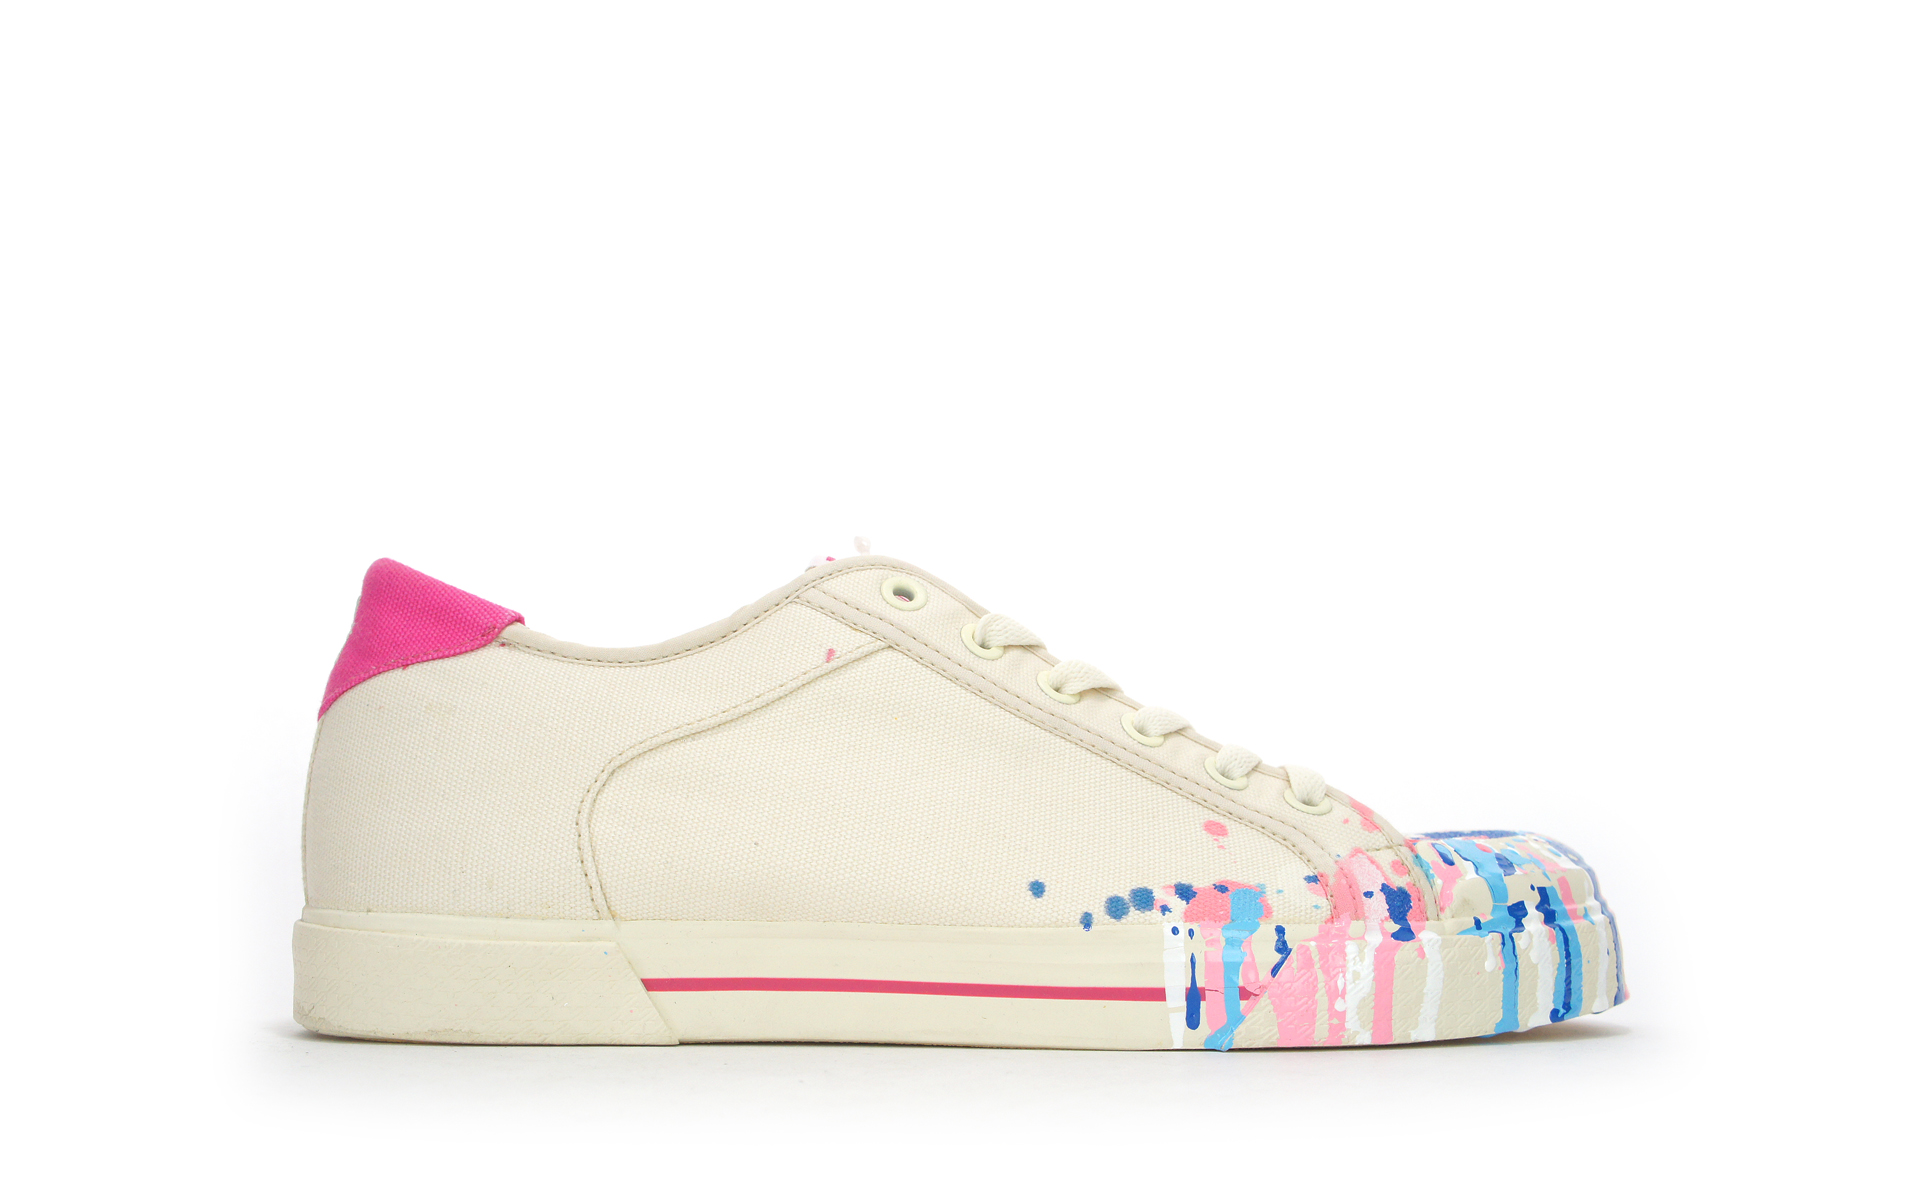 DC Chaussures ANDRE ARTIST SERIES ARKITIP Blanc Rose Multi-Men 's US10